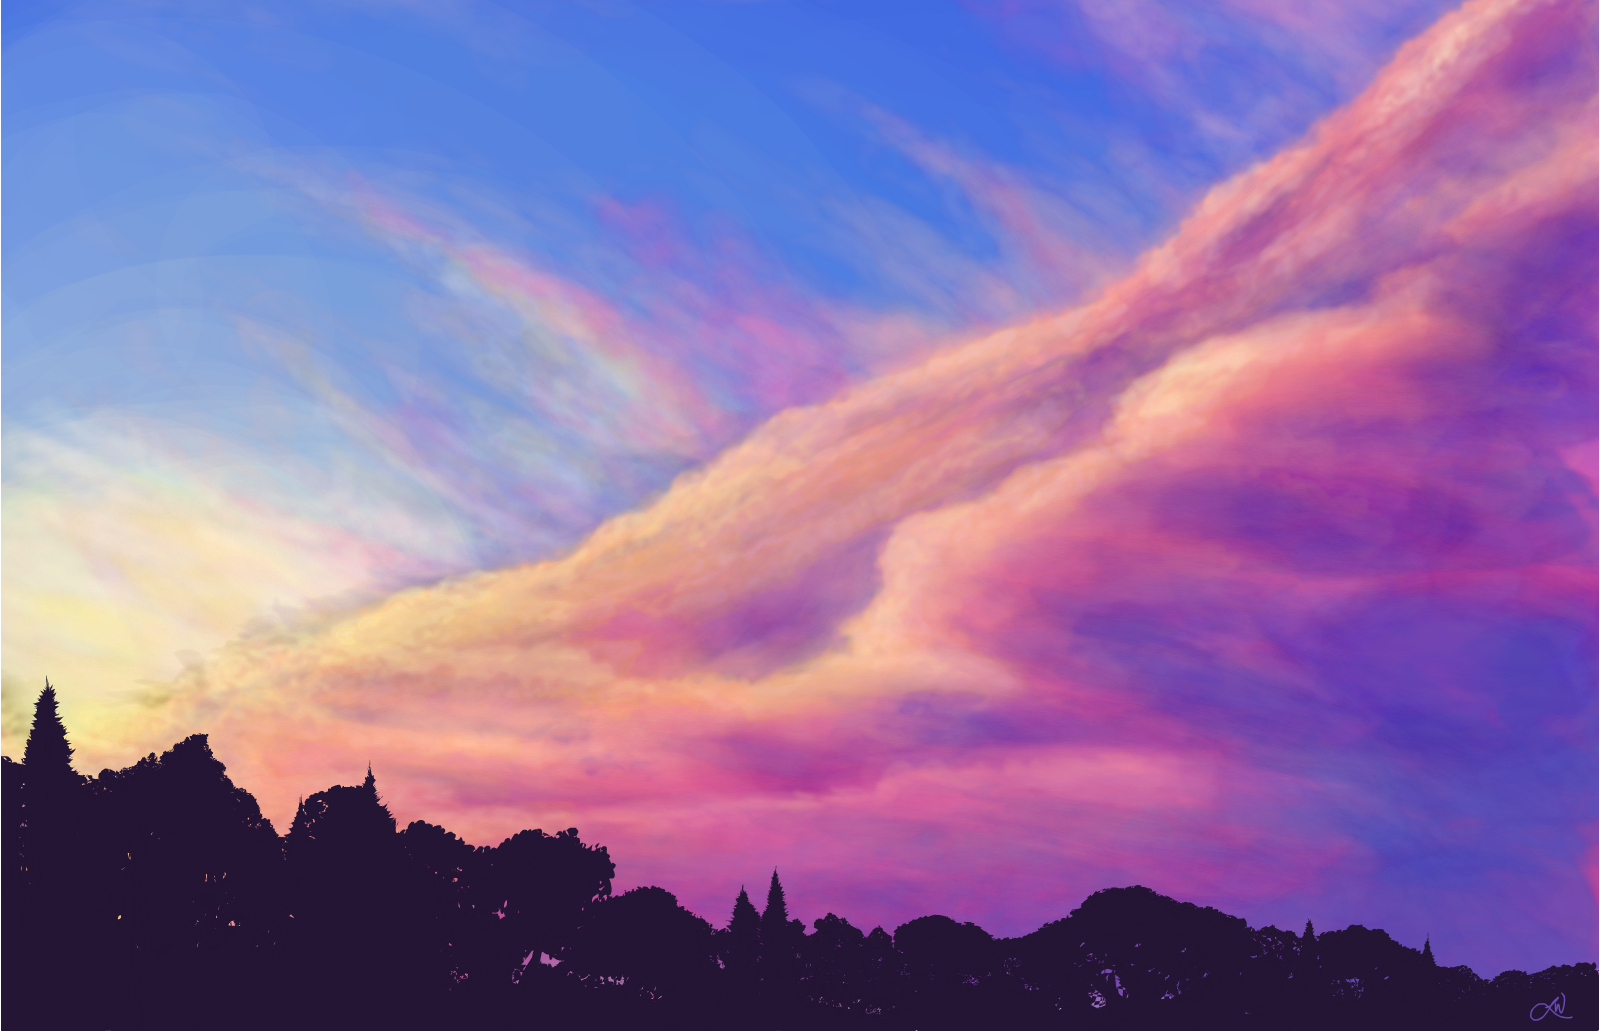 Tide In The Sky 187 Drawings 187 Sketchport